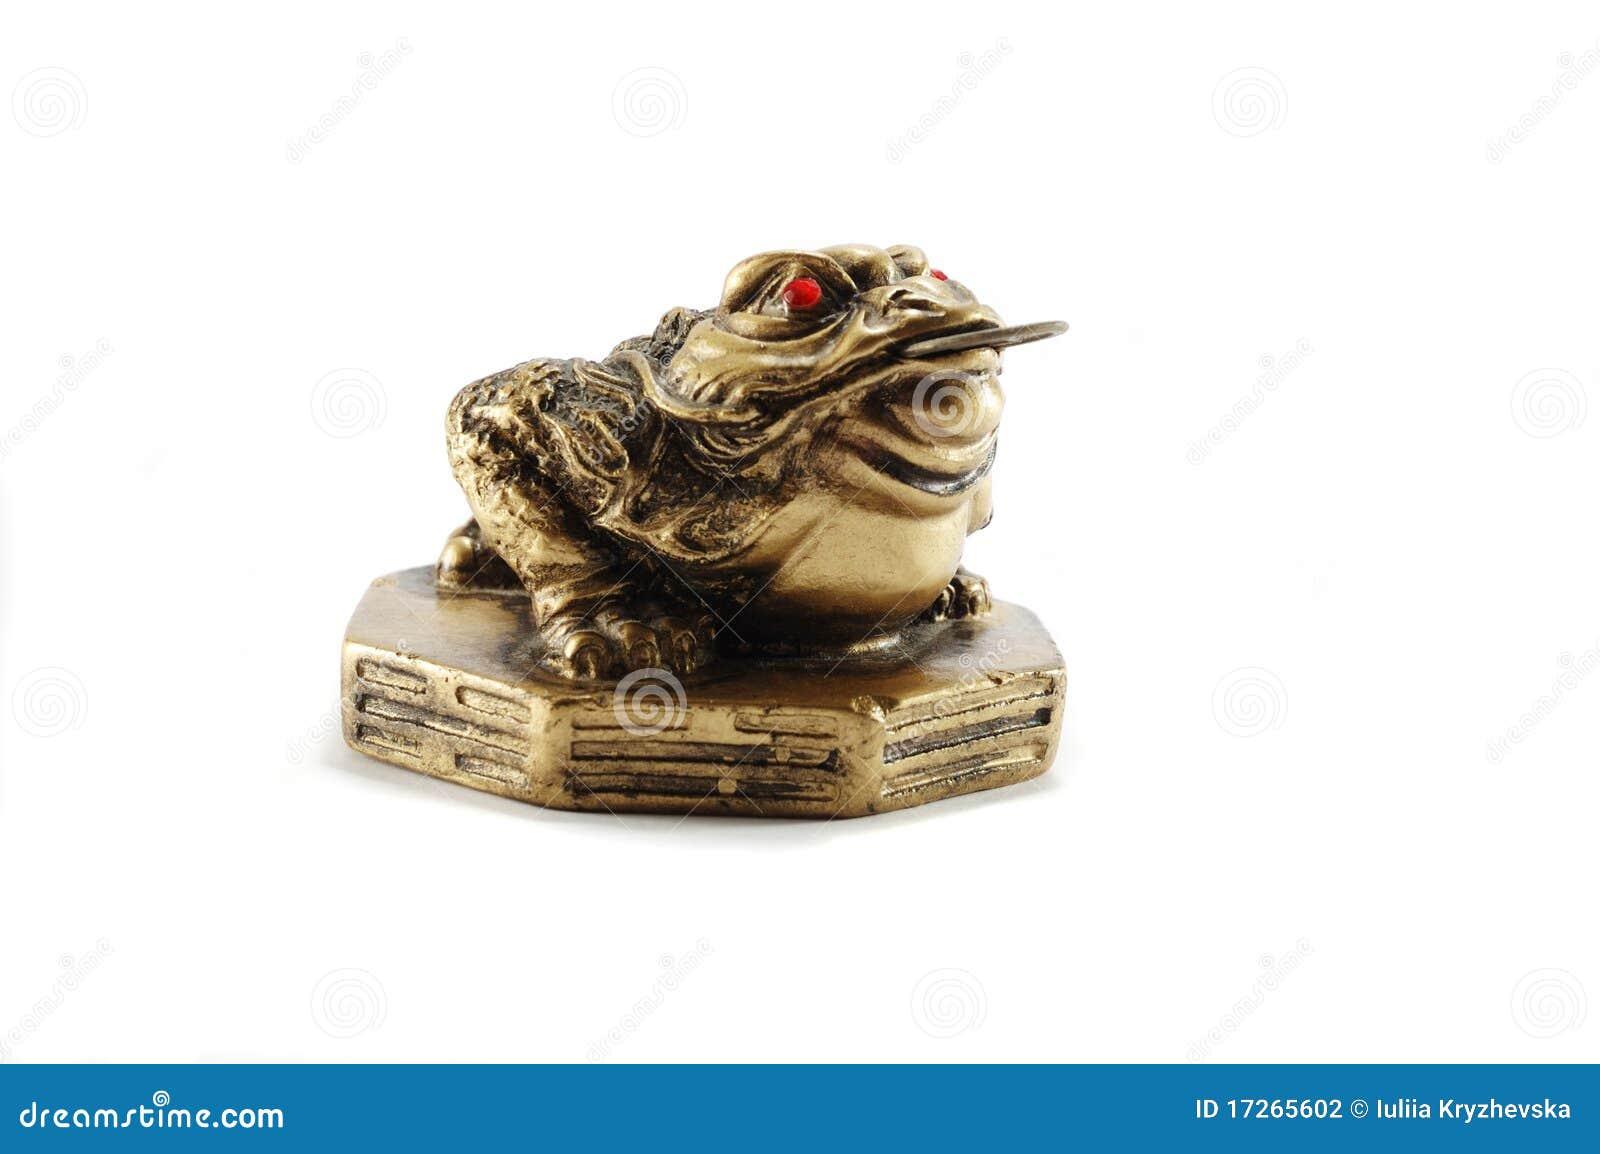 feng shui ou chan chu simbolo da riqueza e da prosperidade mr no pr no #85A724 1300 954